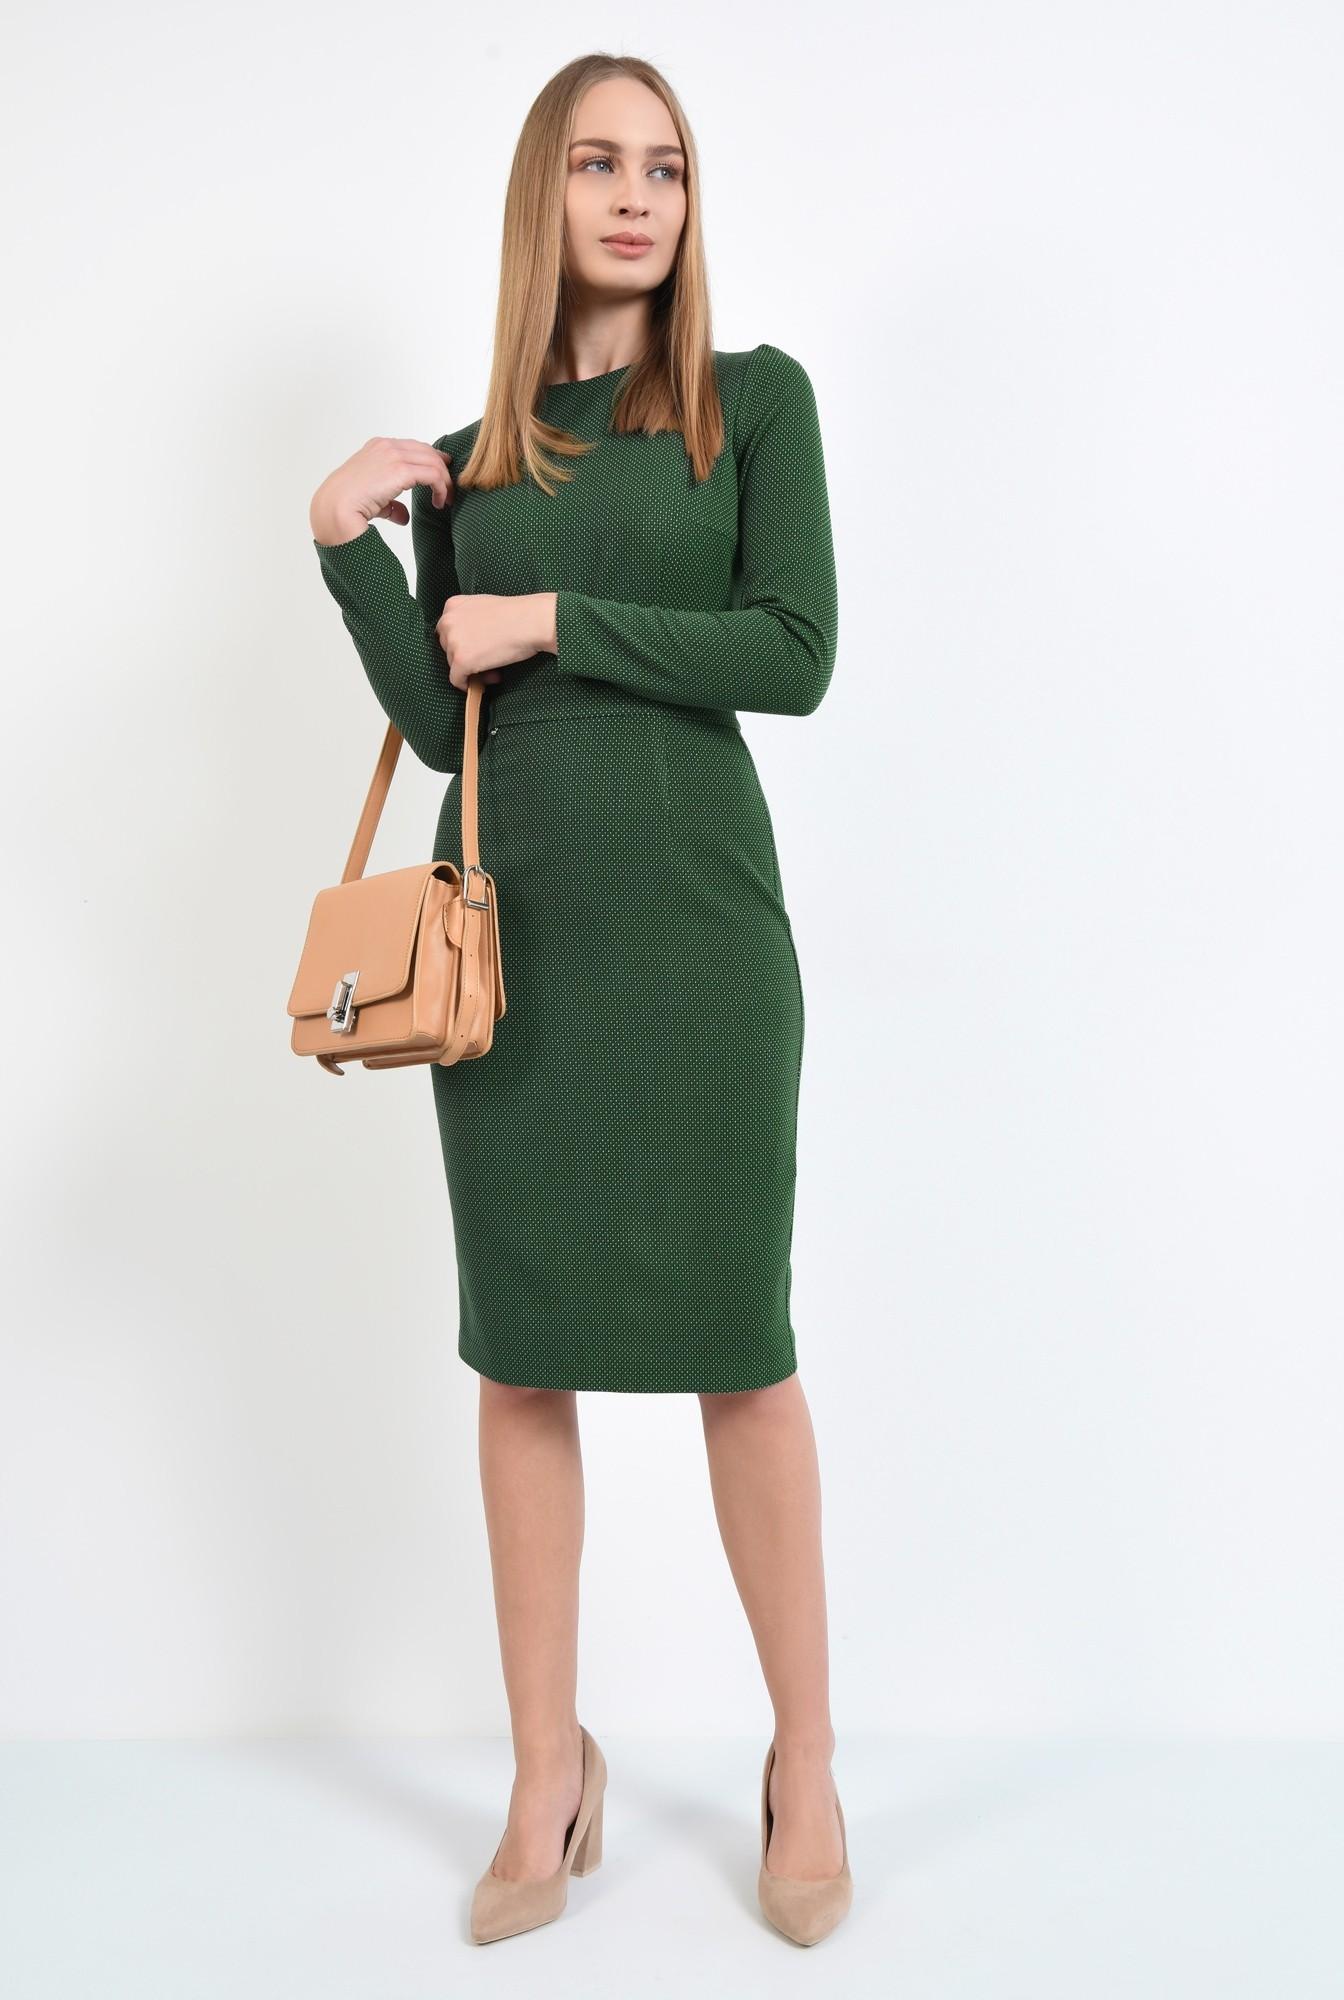 3 - rochie verde, creion, conica, midi, decolteu la baza gatului